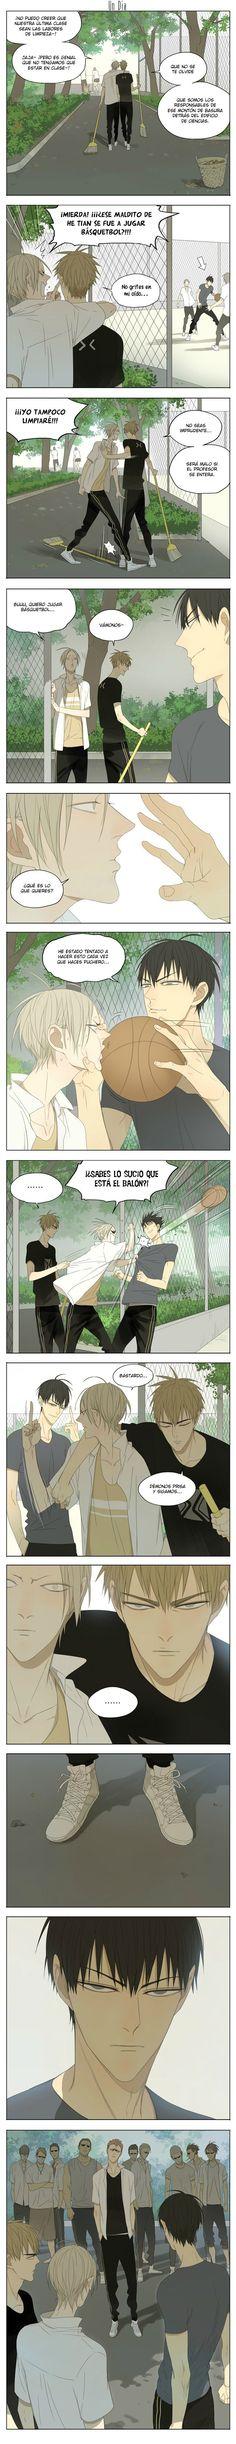 19 Days Capítulo 9 página 1 (Cargar imágenes: 10) - Leer Manga en Español gratis en NineManga.com